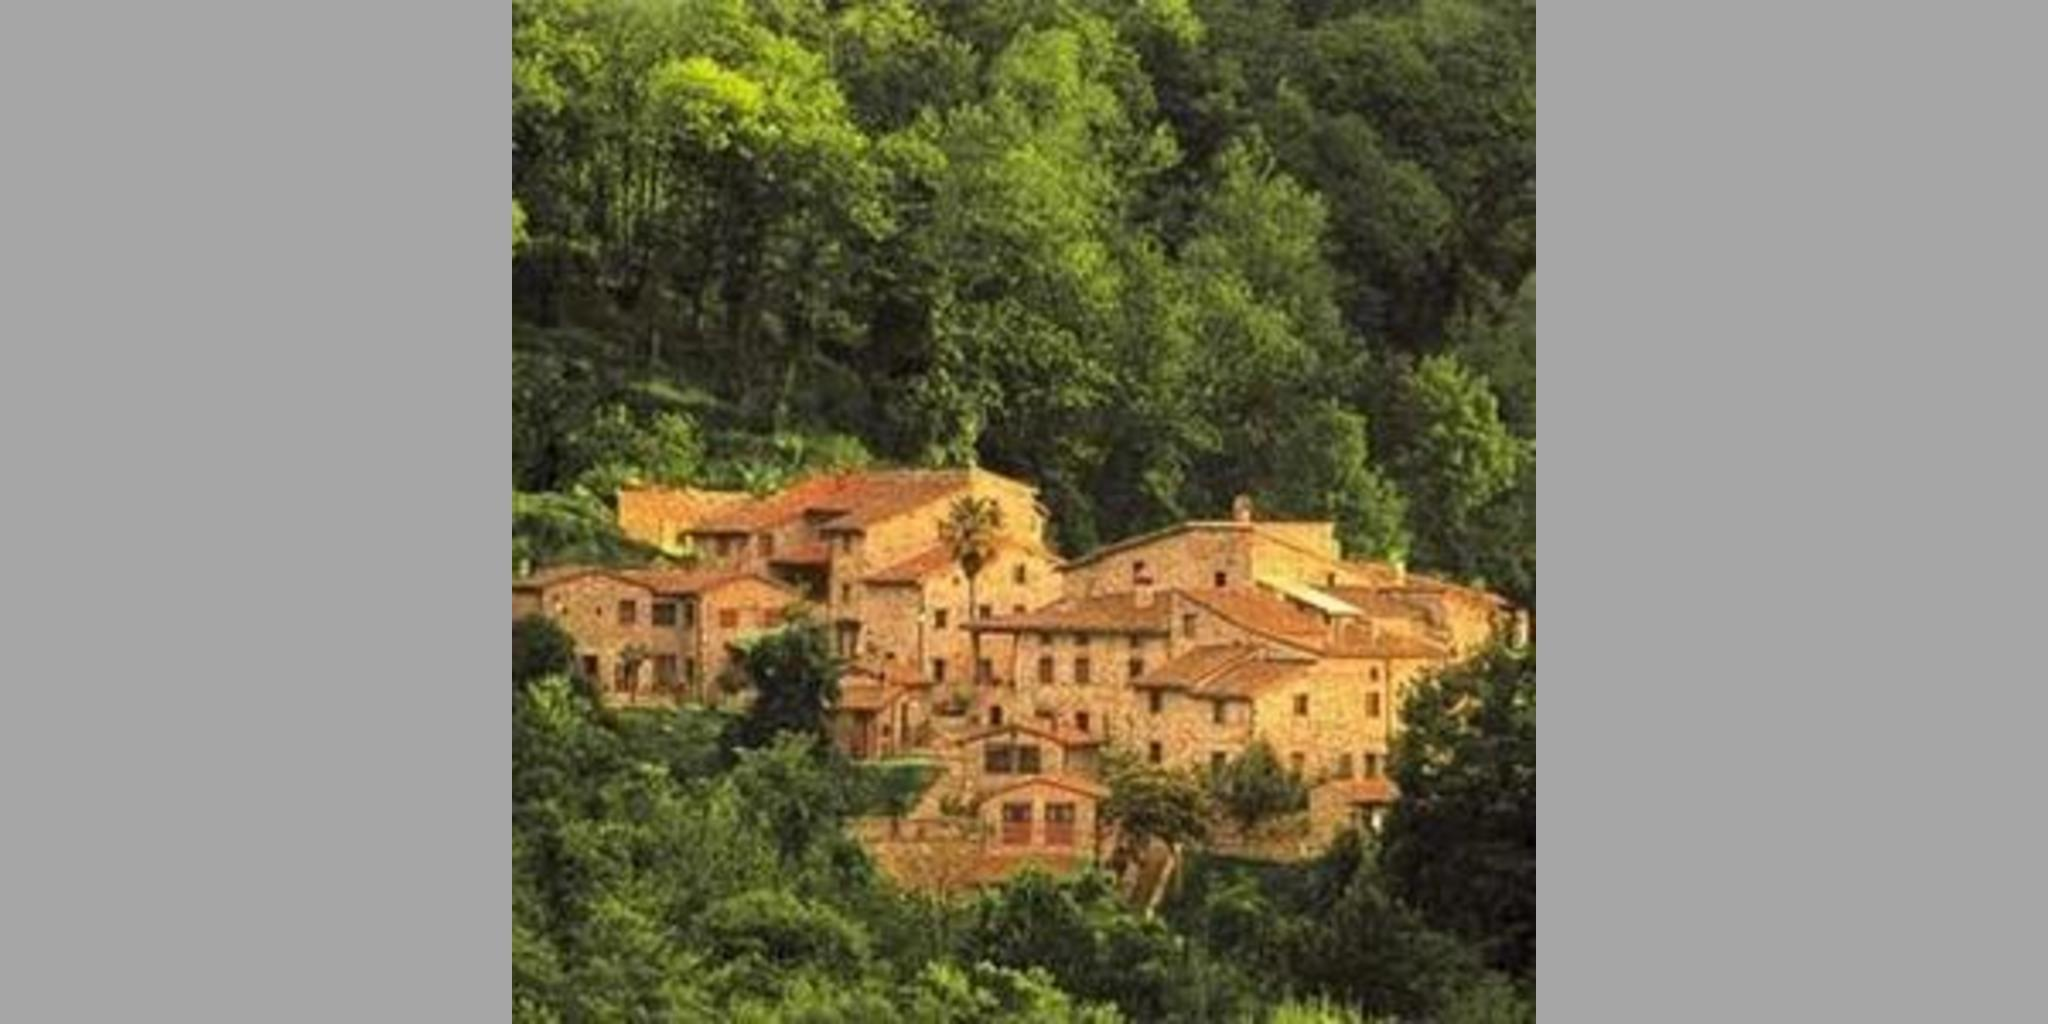 Farmhouse Borgo A Mozzano - Partigliano